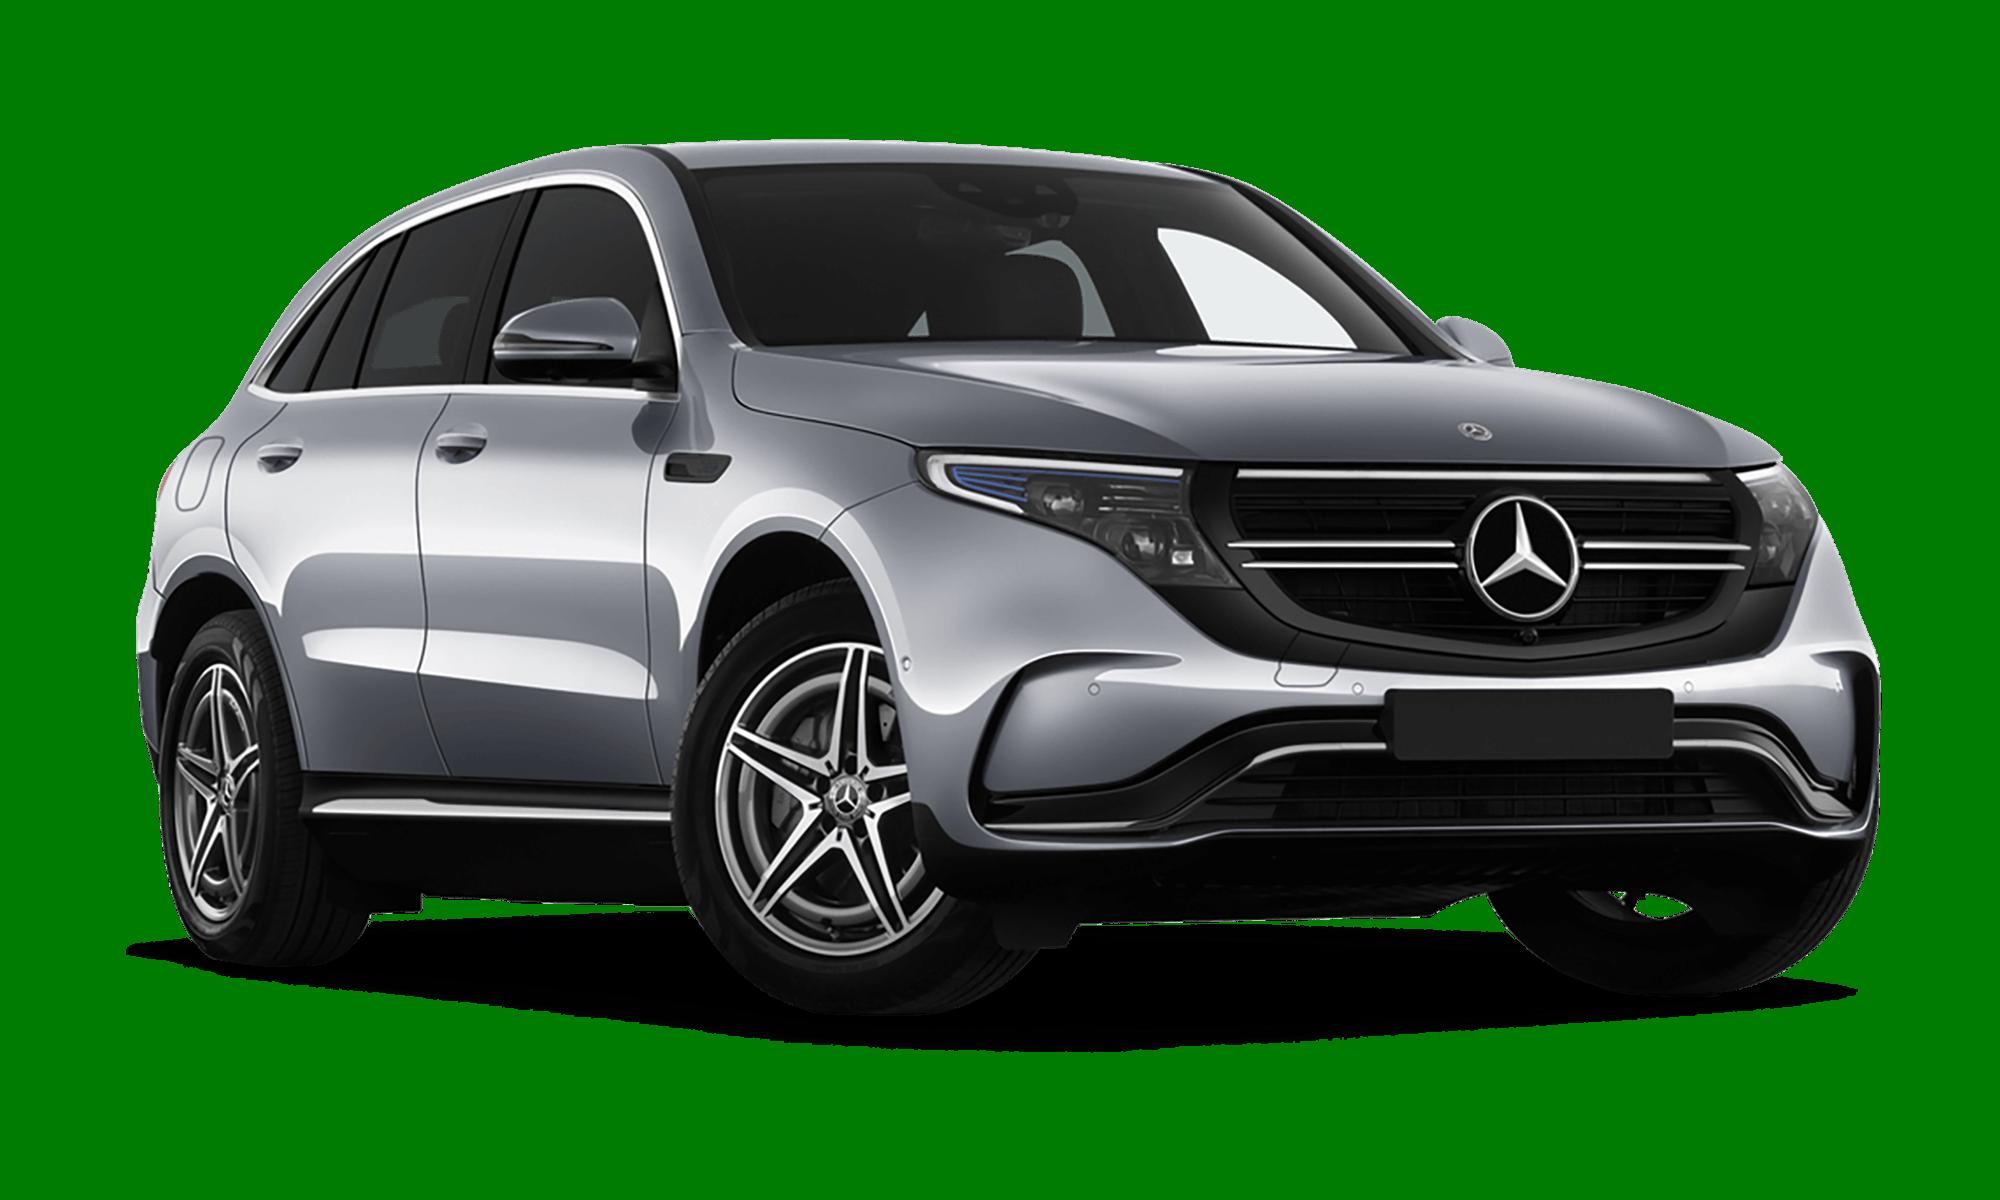 Mercedes Eqc White Background